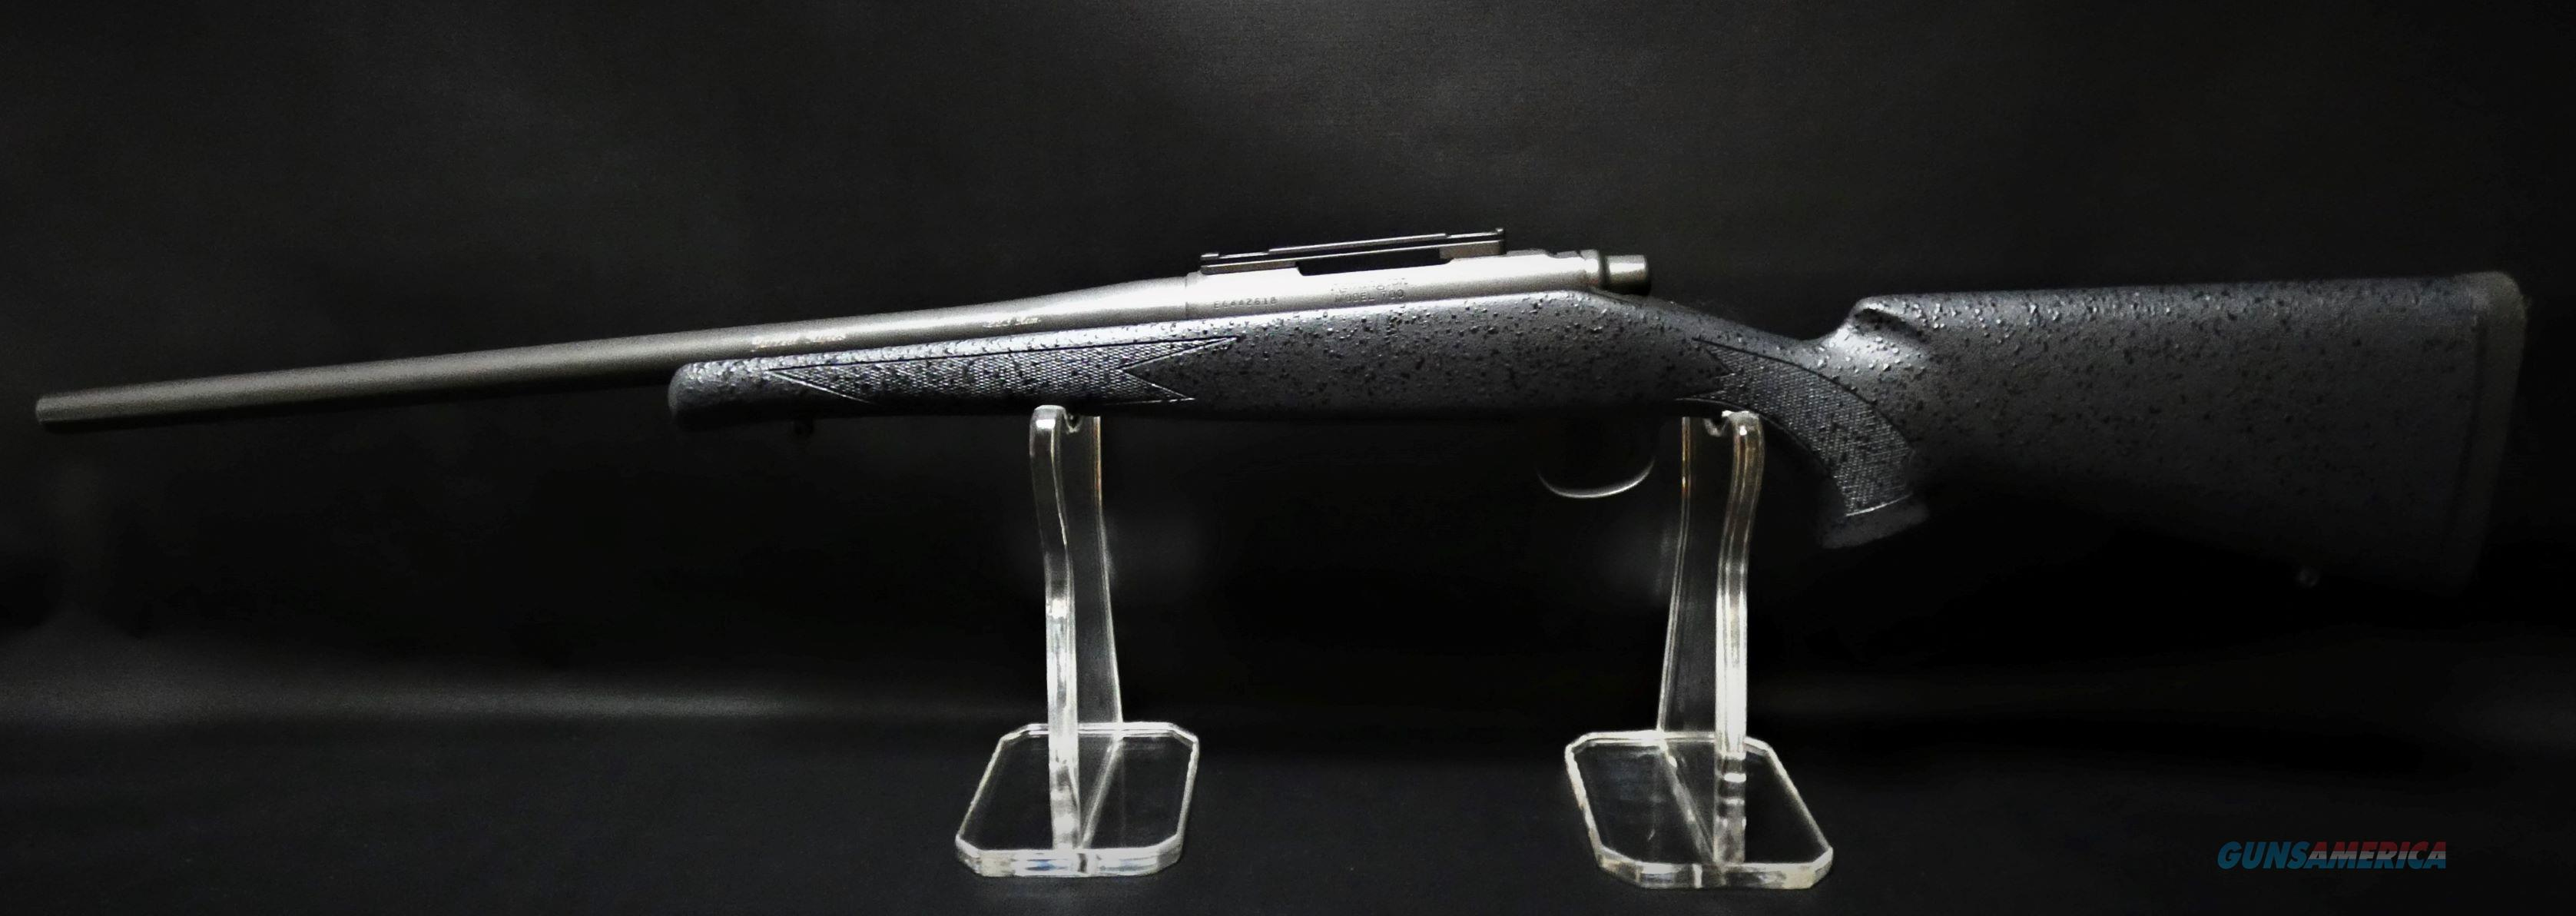 "Jarrett Custom Remington 700 .223 Bolt Action Rifle 20"" BBL  Guns > Rifles > Custom Rifles > Bolt Action"